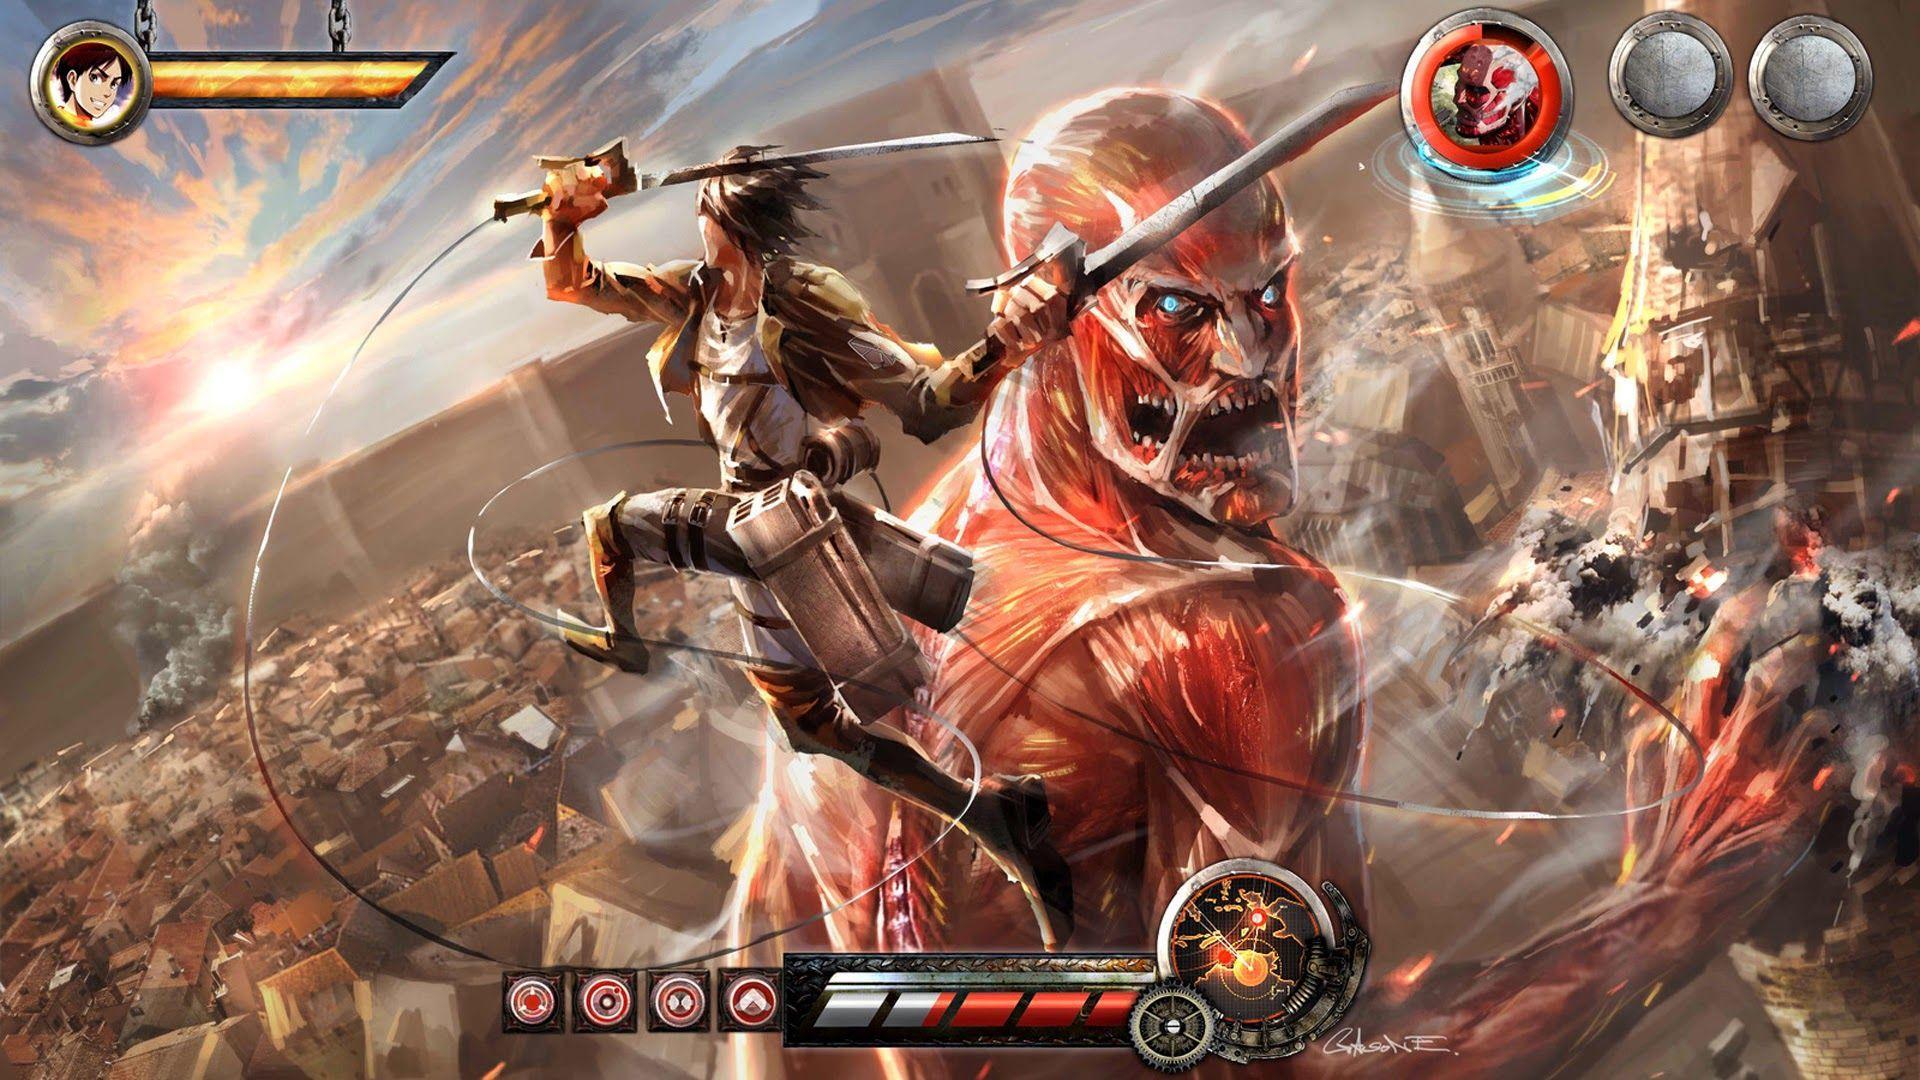 1920x1080 Attack on Titan Hình nền iPhone